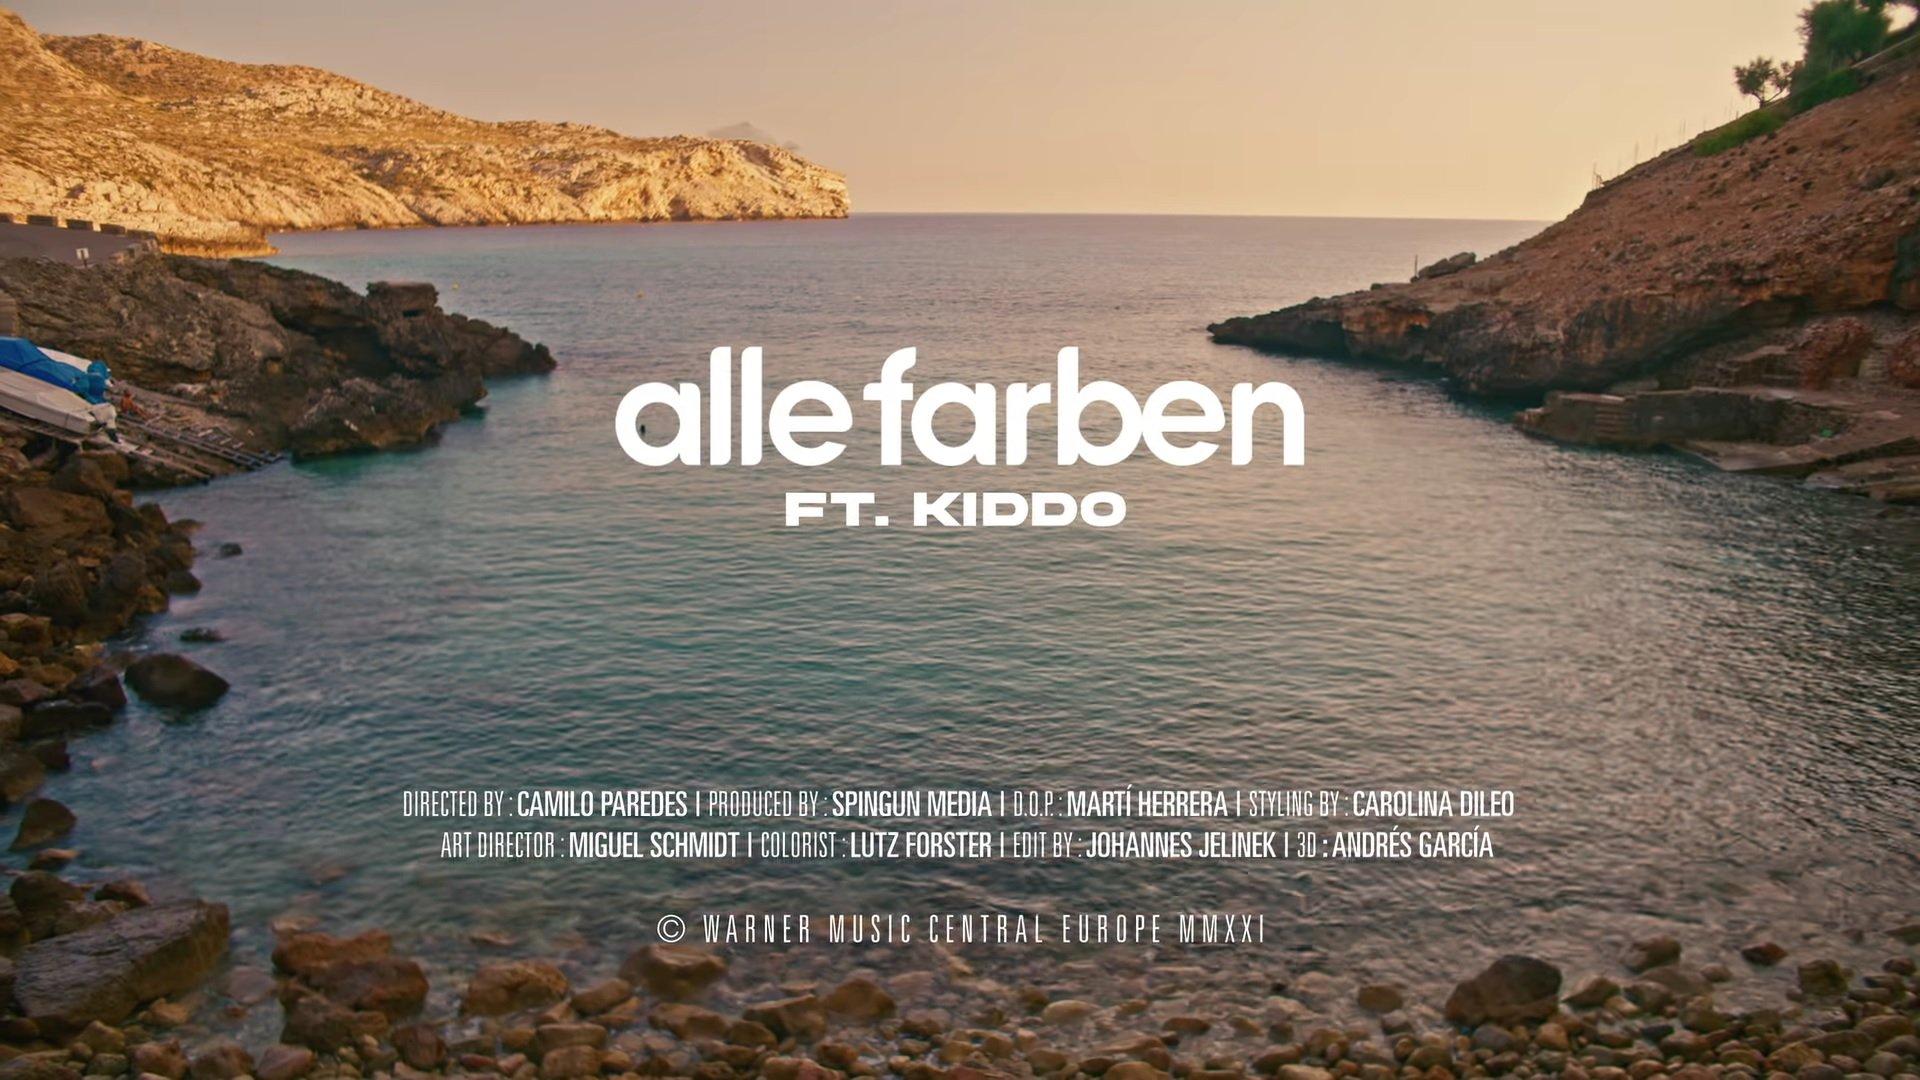 ALLE FARBEN Alright feat. KIDDO